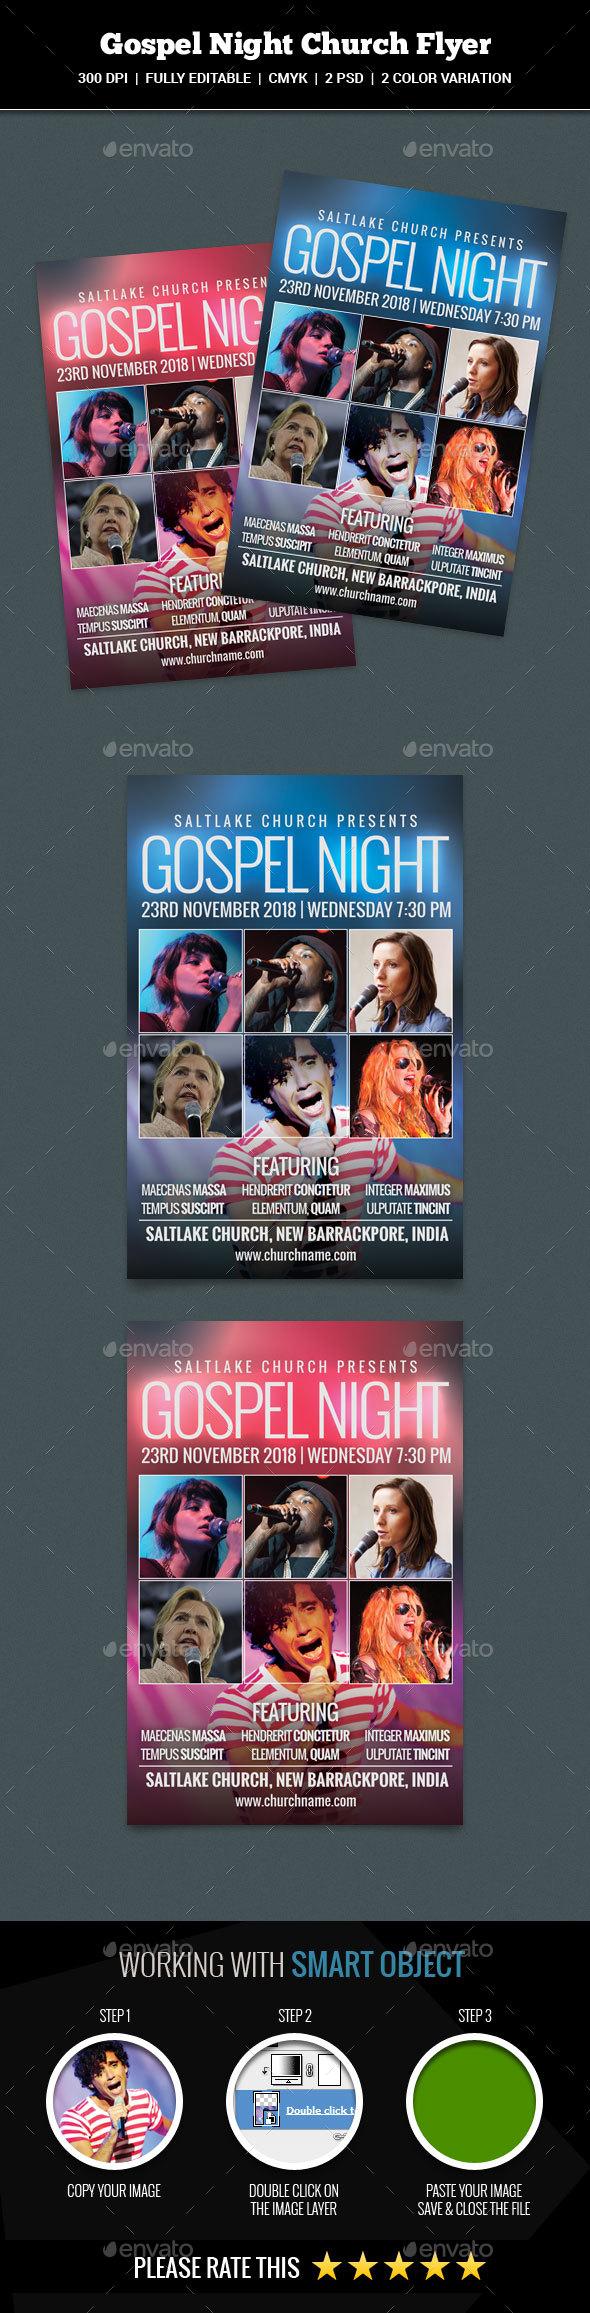 Gospel Night Church Flyer - Church Flyers